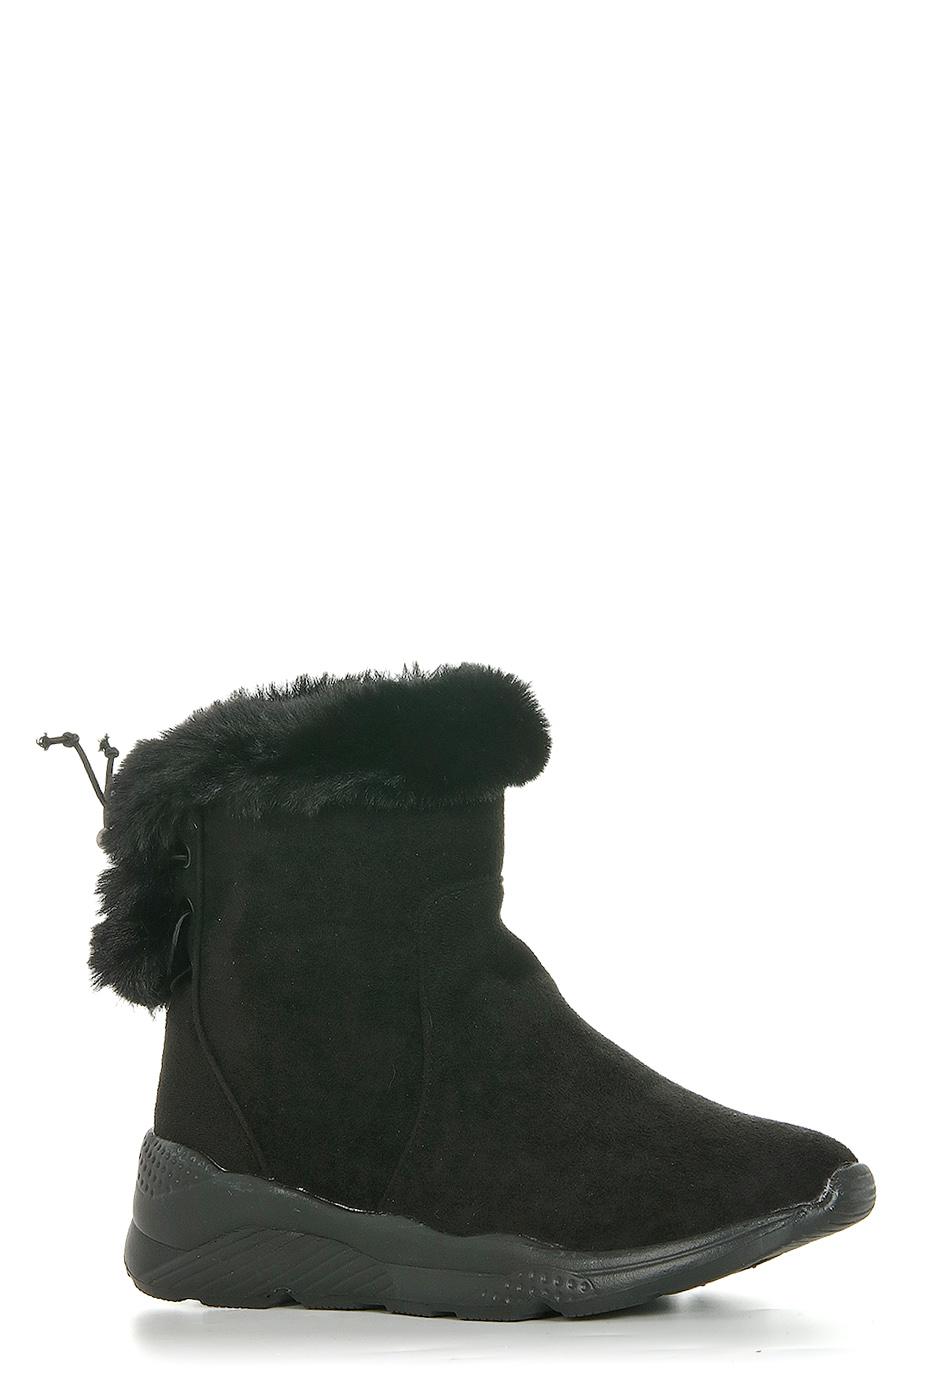 Ботинки TOPLAND2352-PB76262B/BLACK